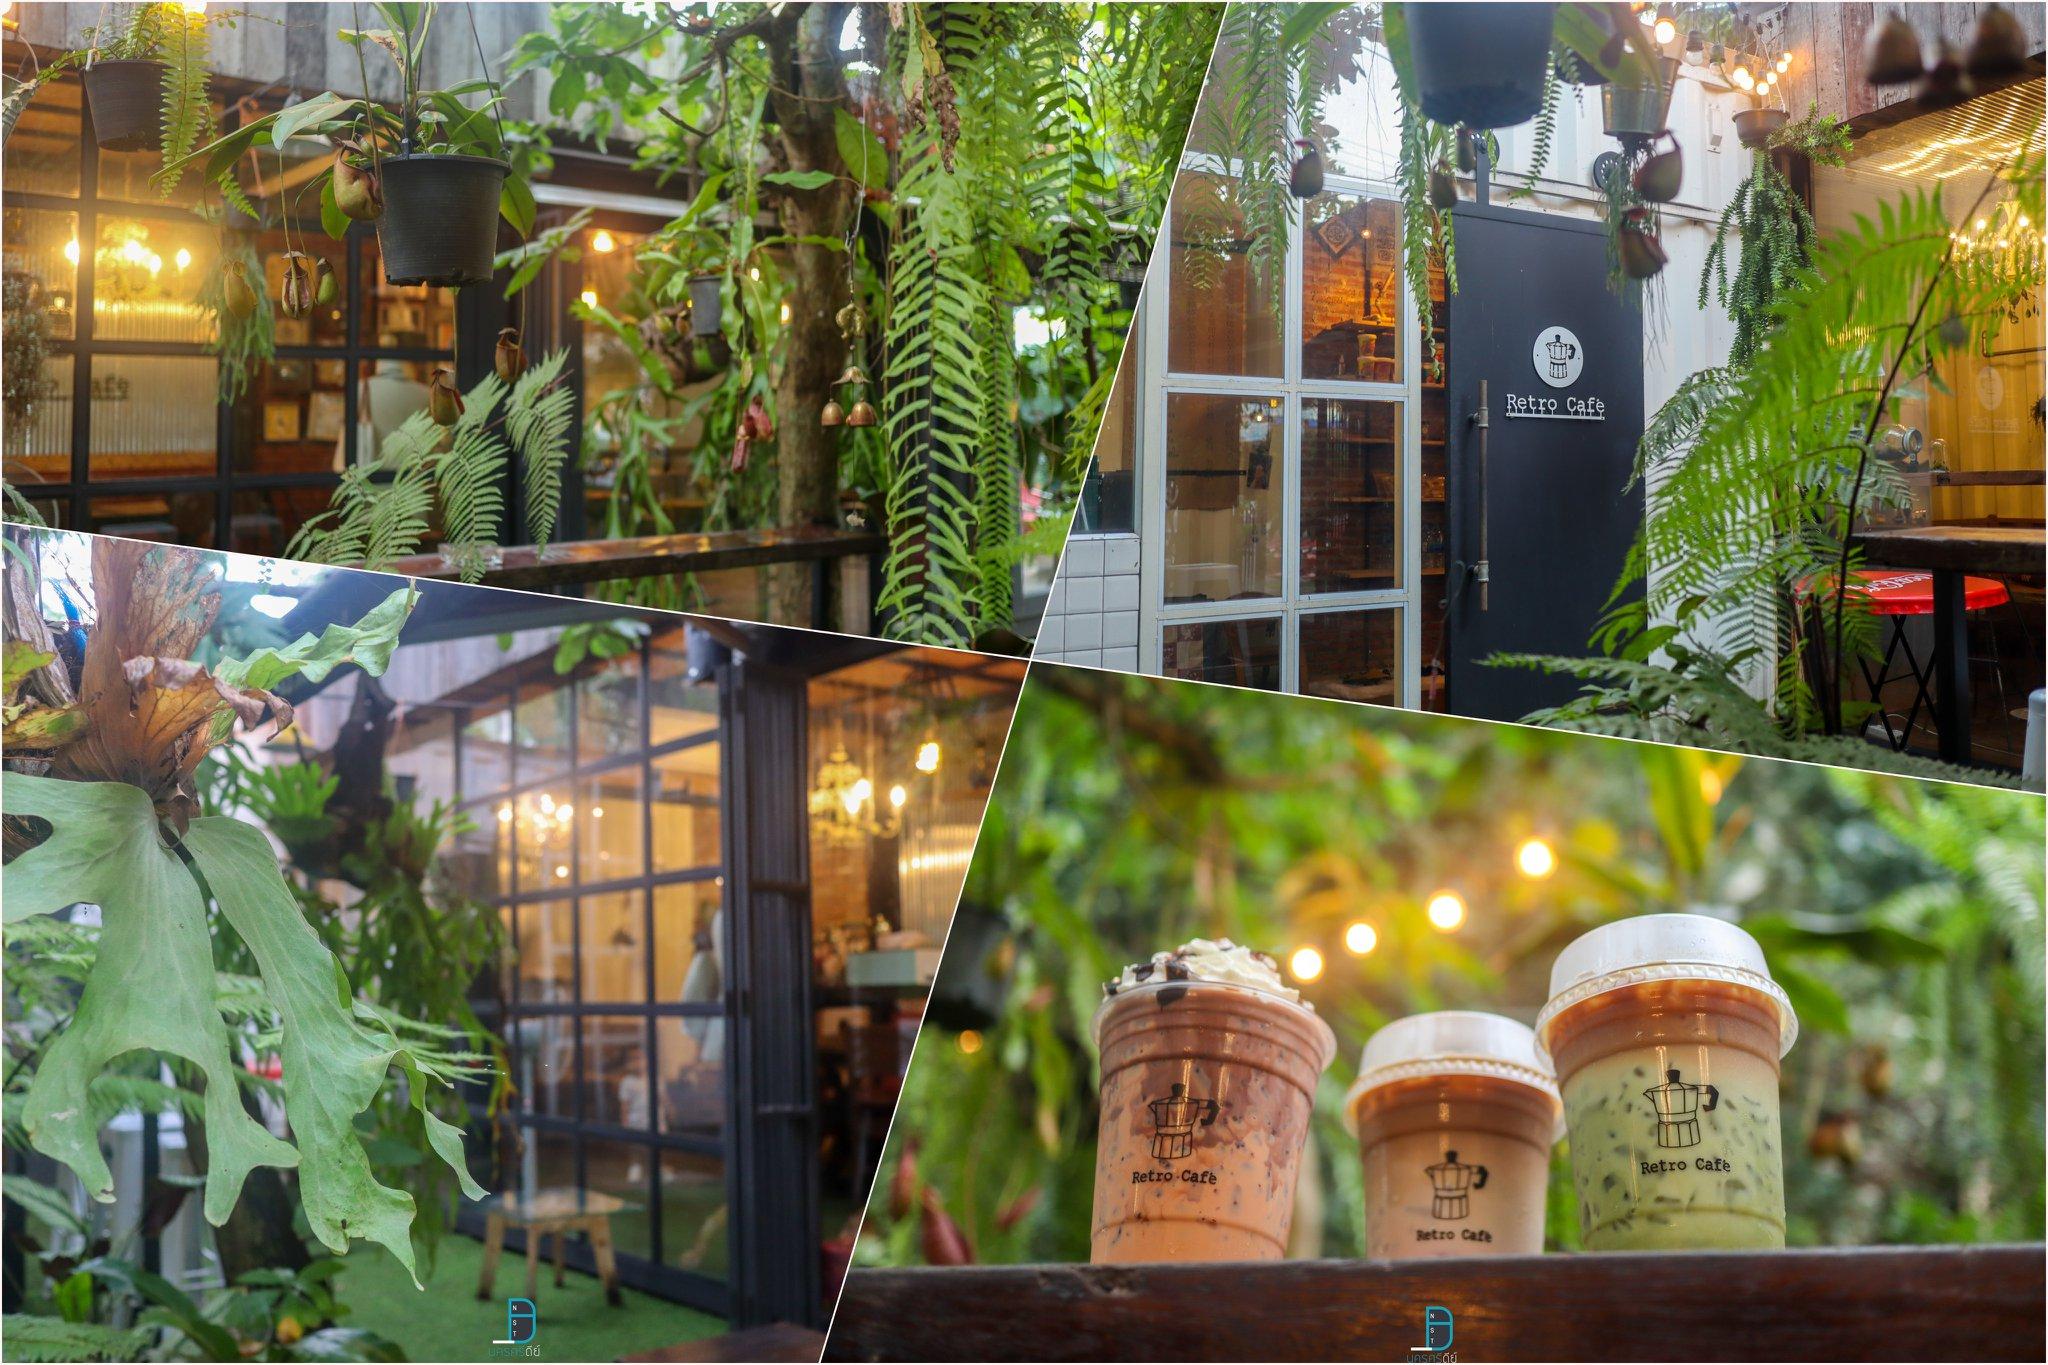 35.-Retro-Cafe-เรโทร-คาเฟ่ รายละเอียด-คลิก แหล่งท่องเที่ยว,นครศรี,จุดเช็คอิน,จุดถ่ายรูป,คาเฟ่,ของกิน,จุดกิน